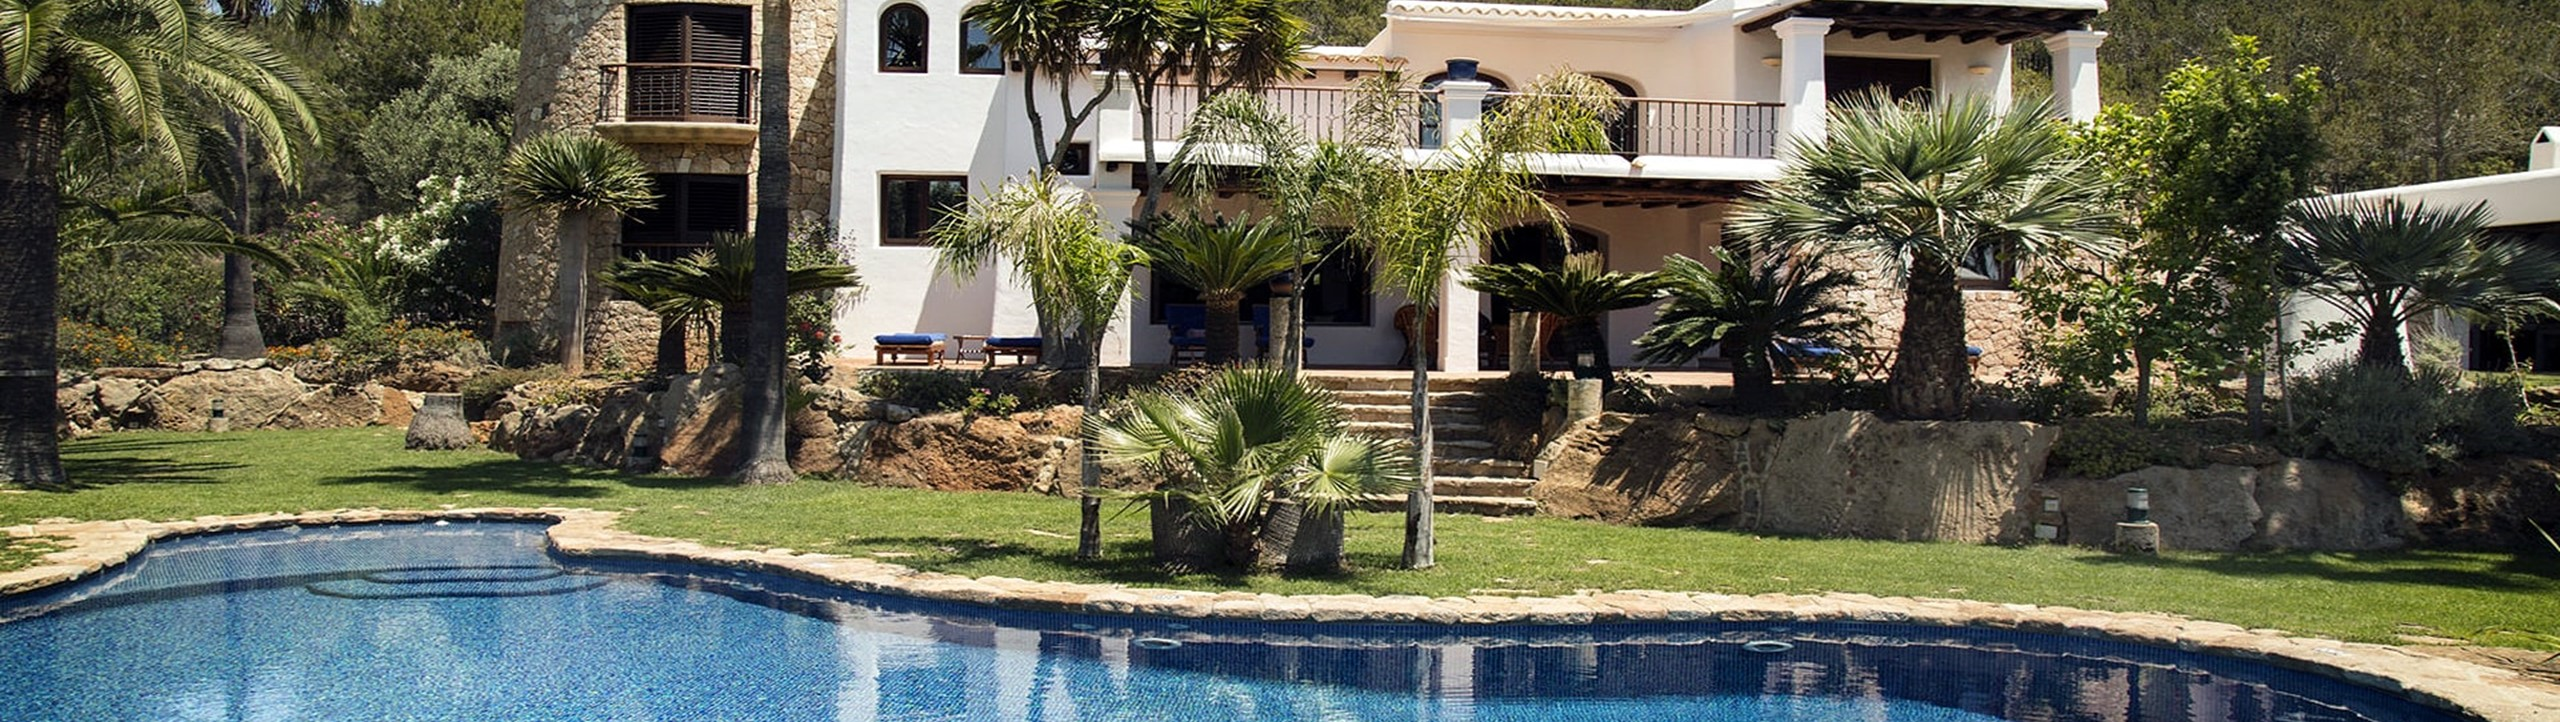 Villa Egos Ibiza 1